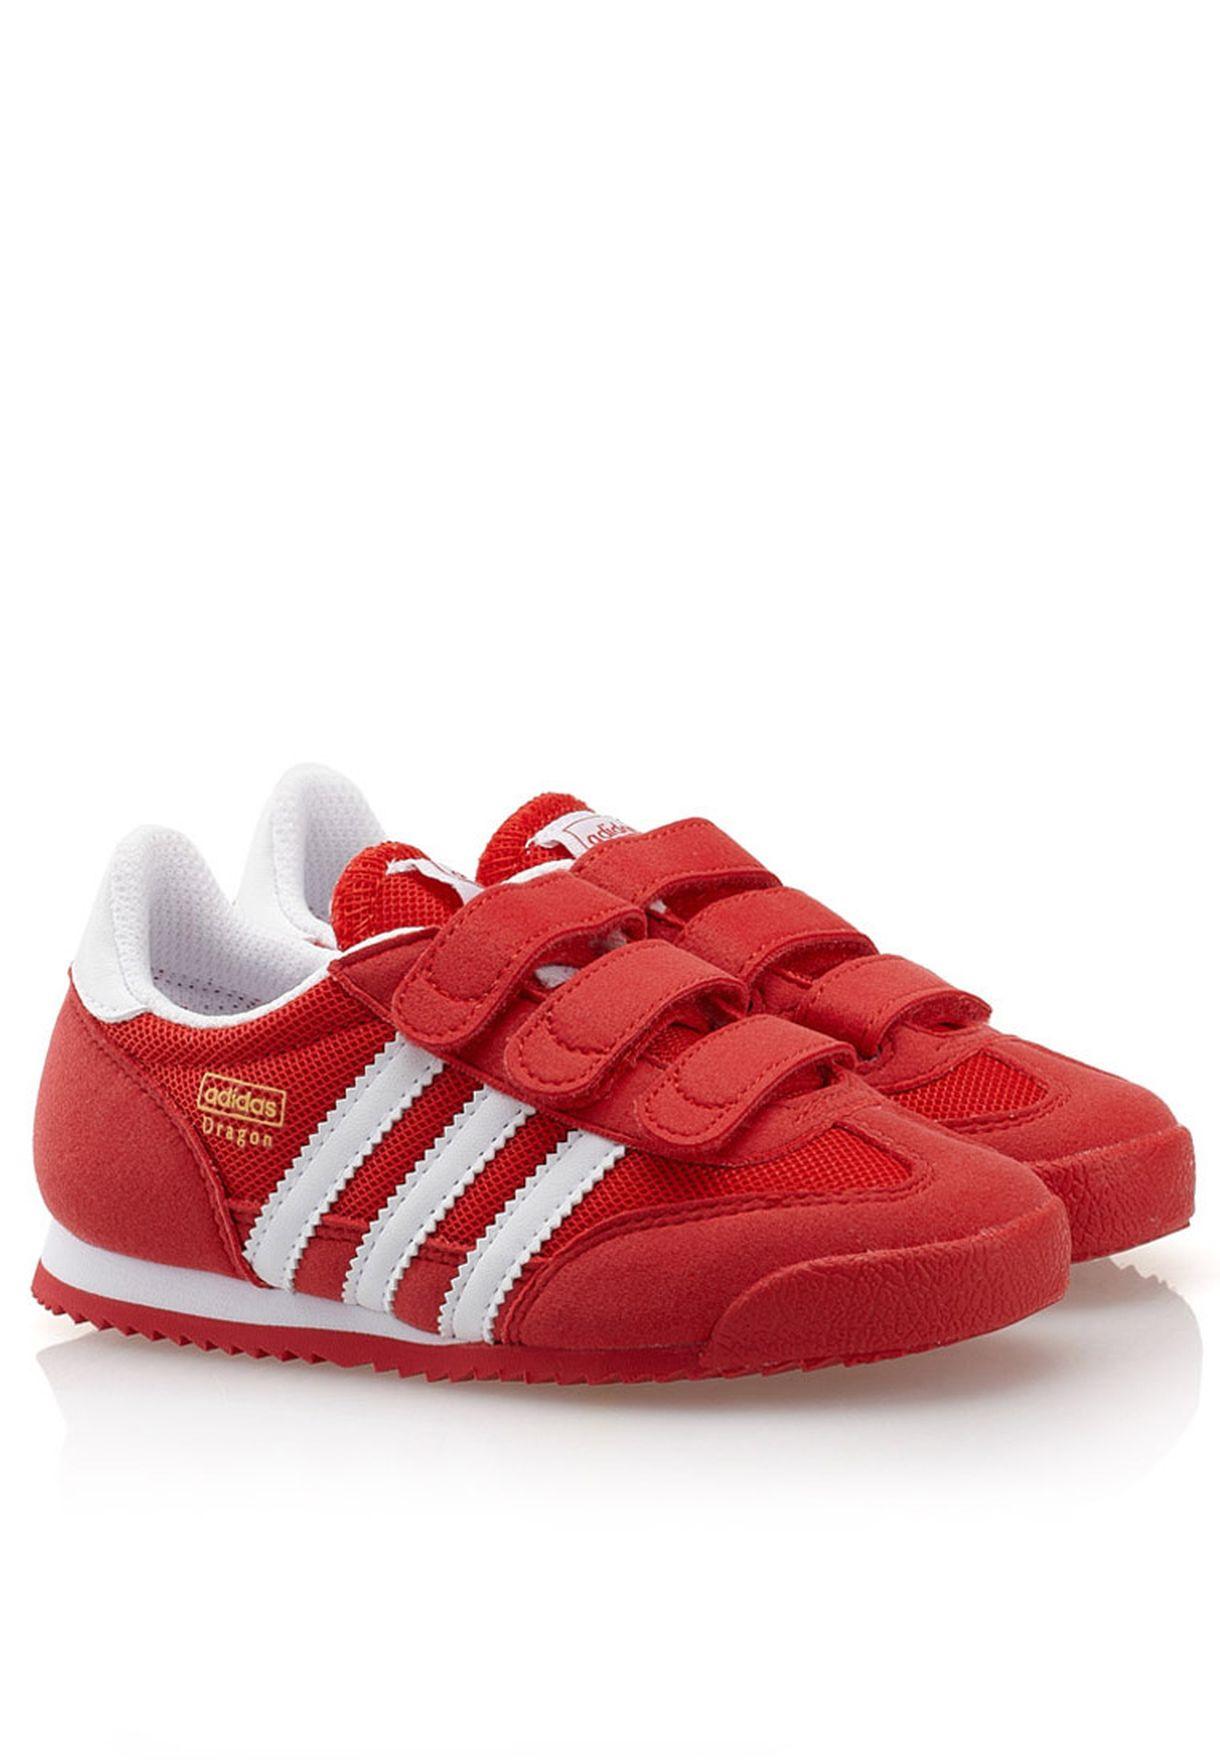 María Flecha Es decir  Buy Adidas Originals Red Dragon Cf C Sneakers for Kids in Mena, Worldwide,  Globally | AD476SH44THB